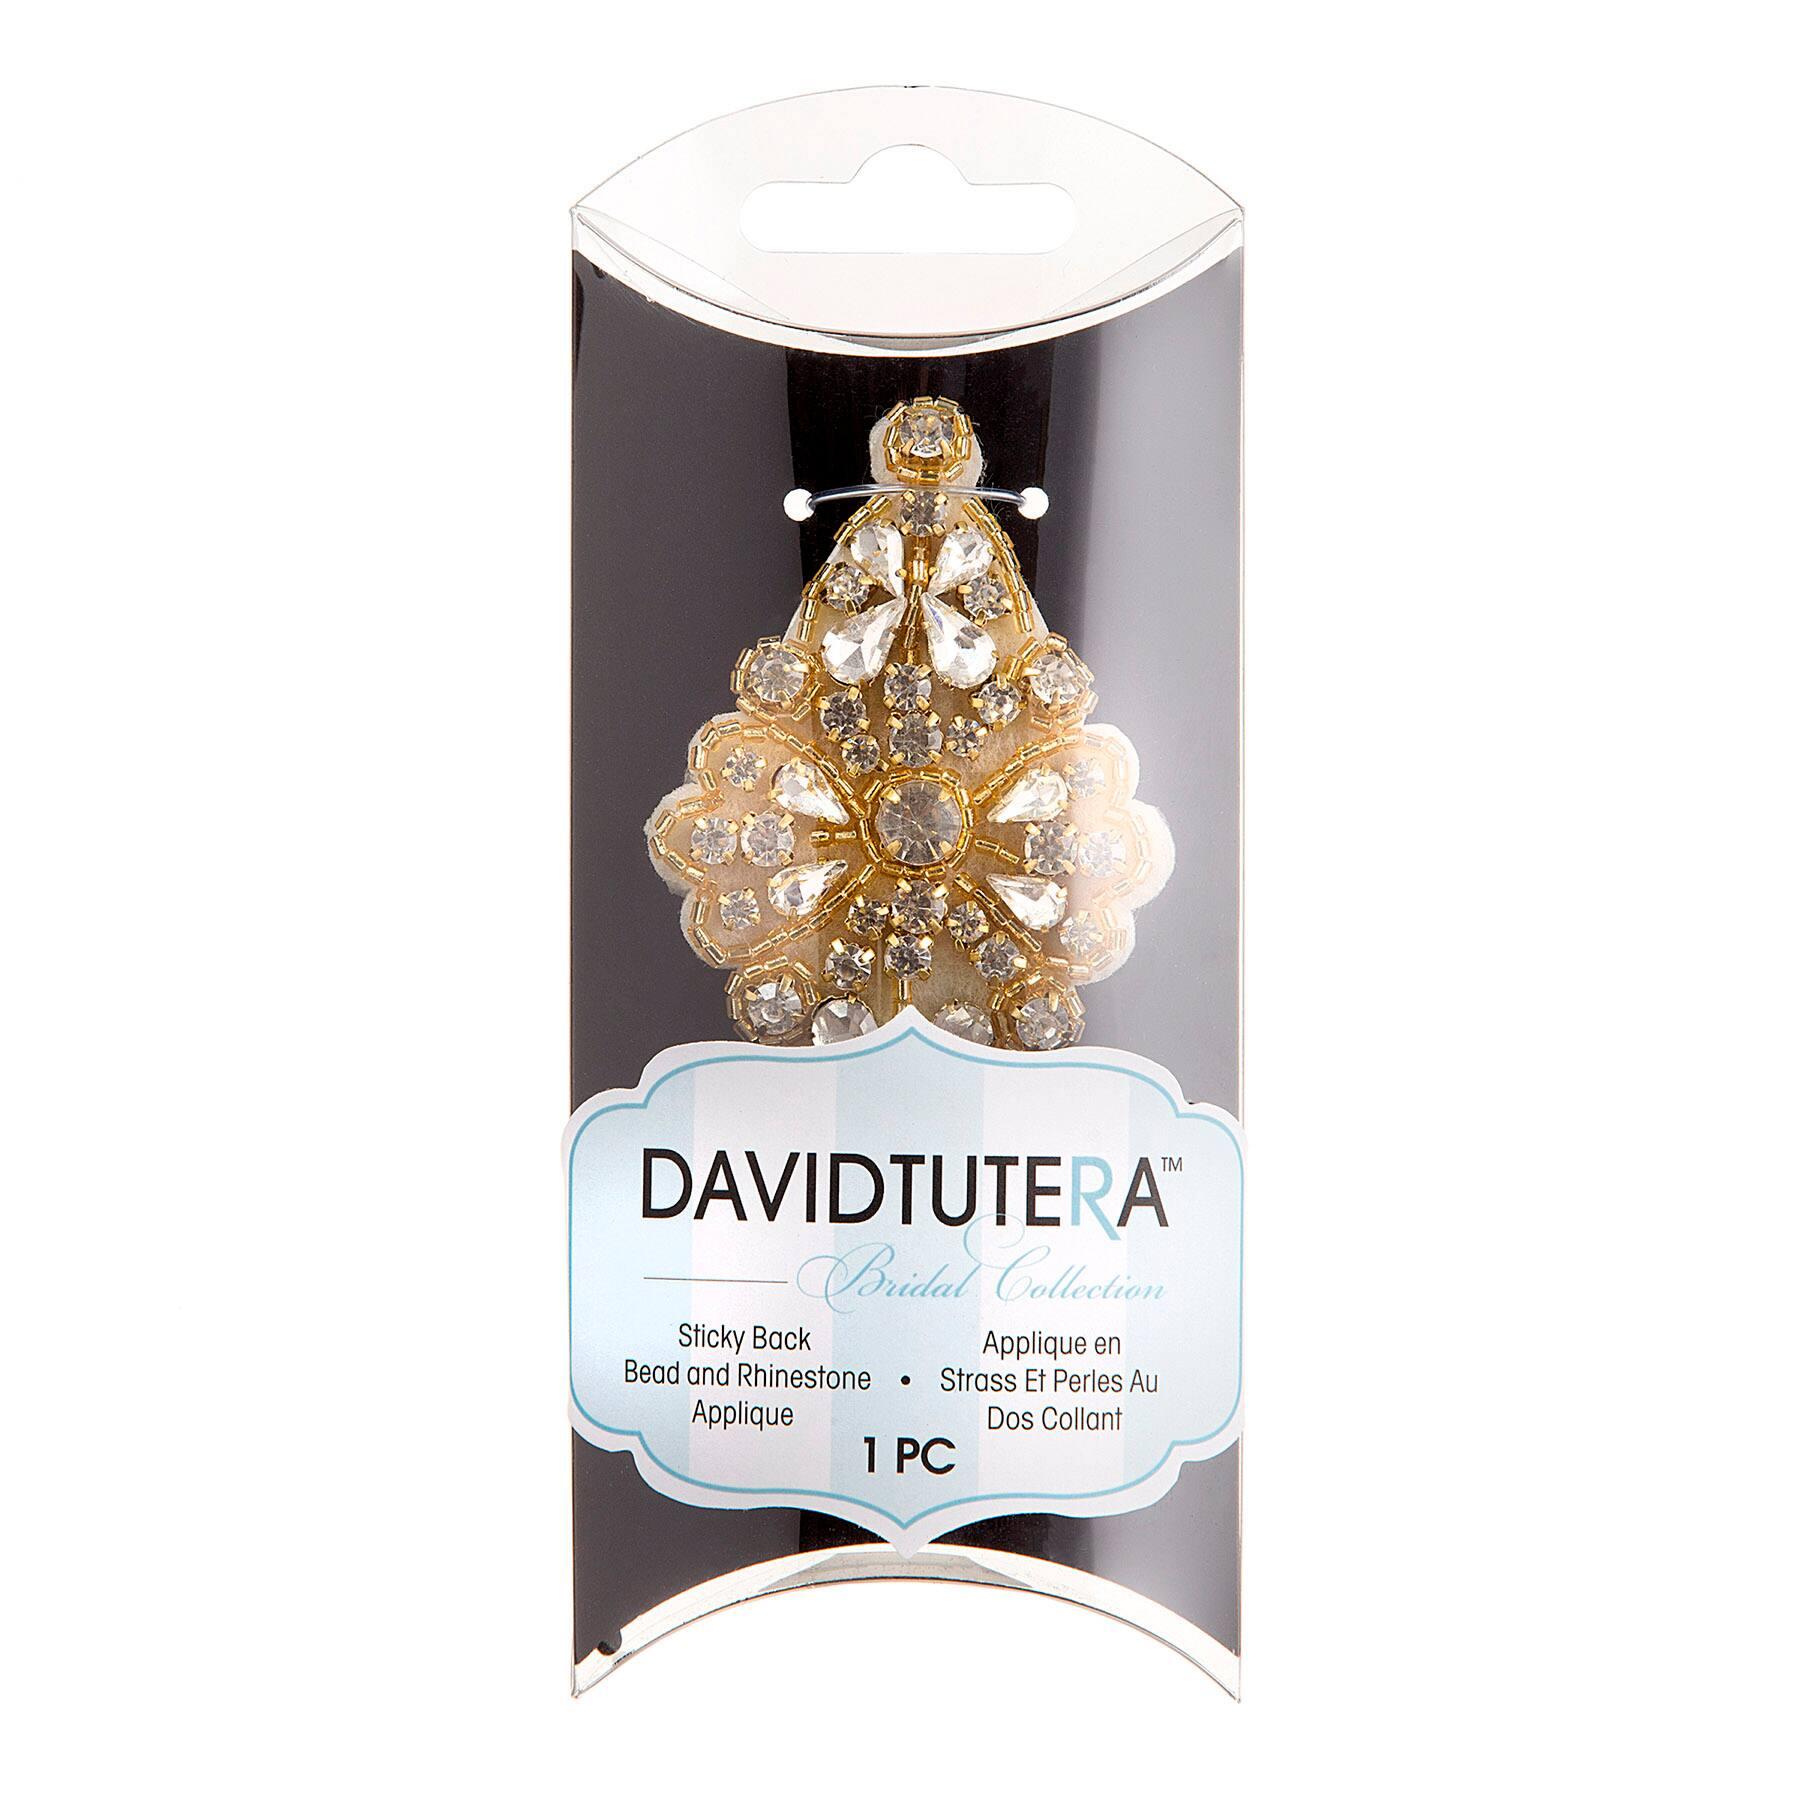 20 Diamante Beads Rhinestones Diamante Box Frame Crystals REDUCED Weddings